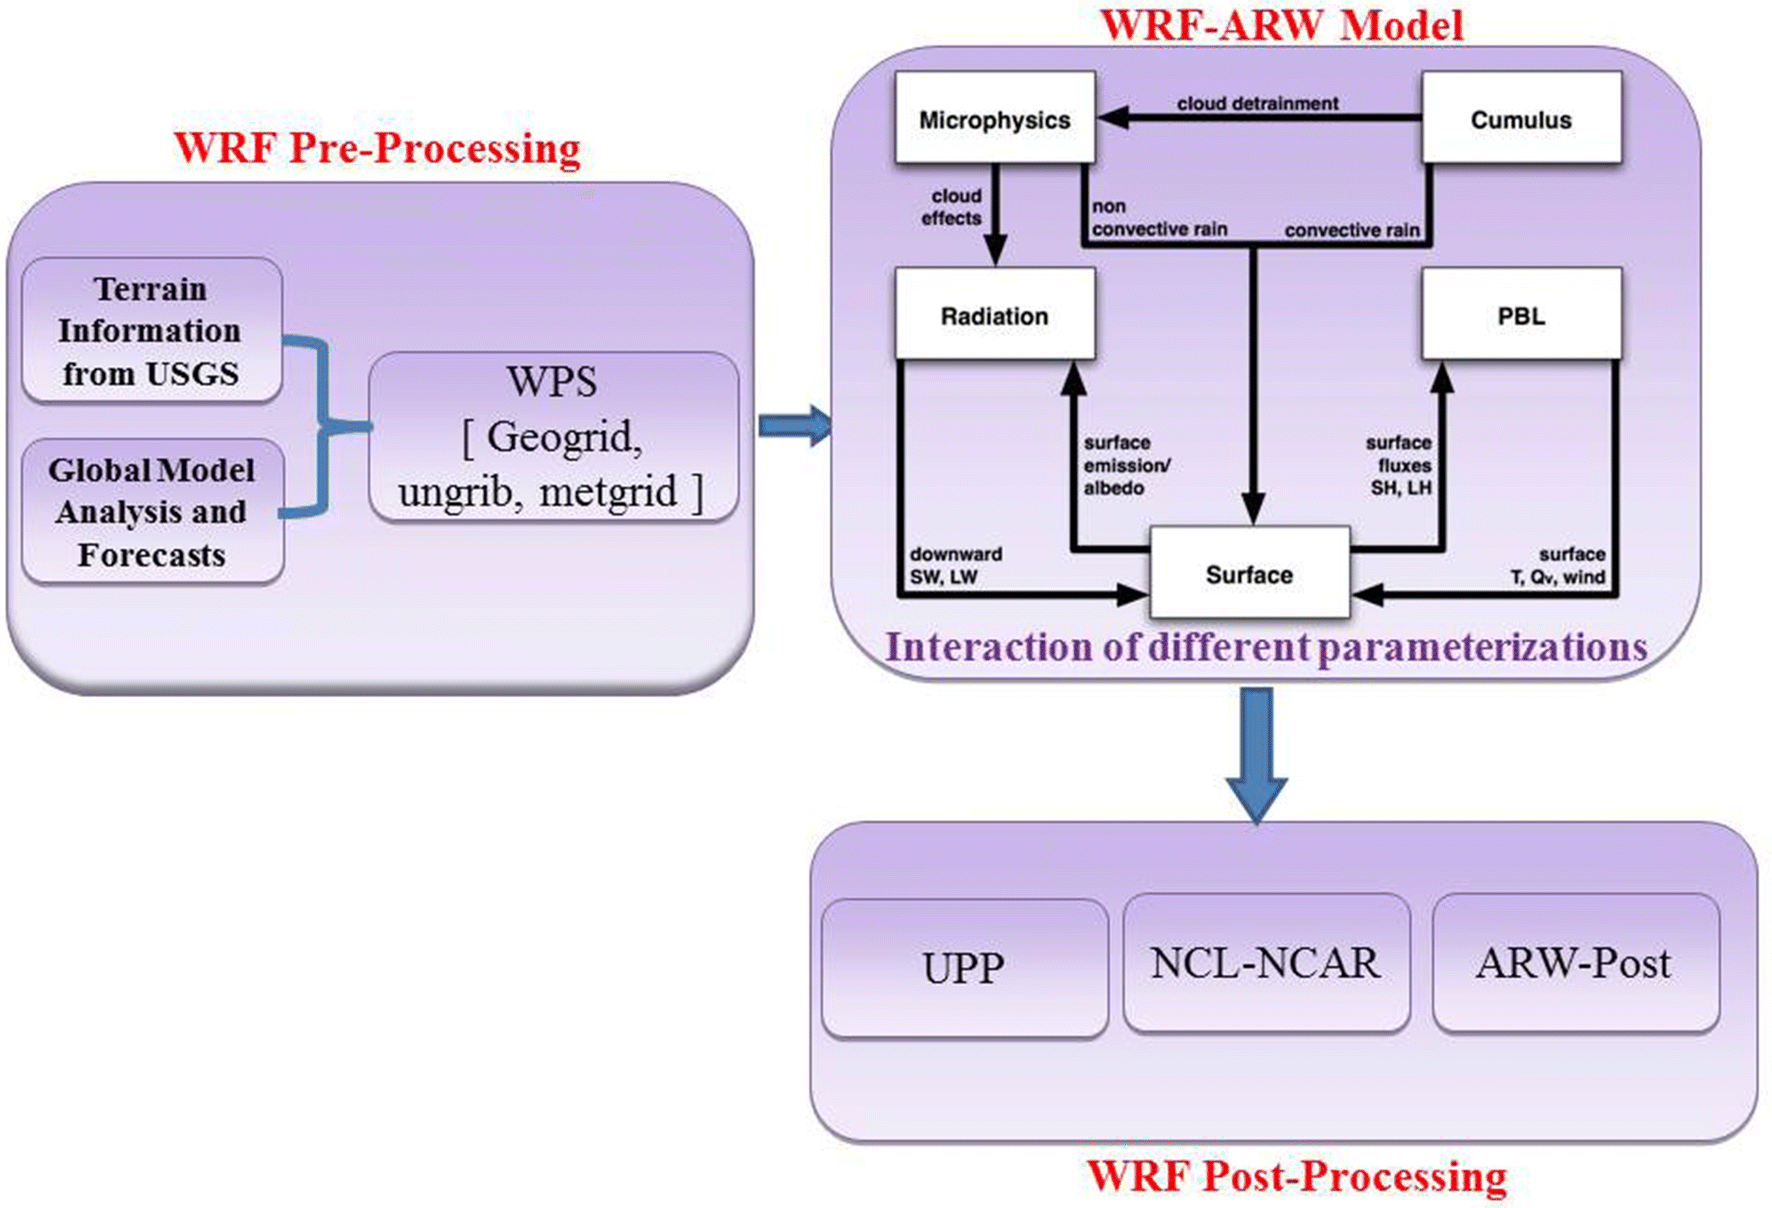 Performance Optimization of Operational WRF Model Configured